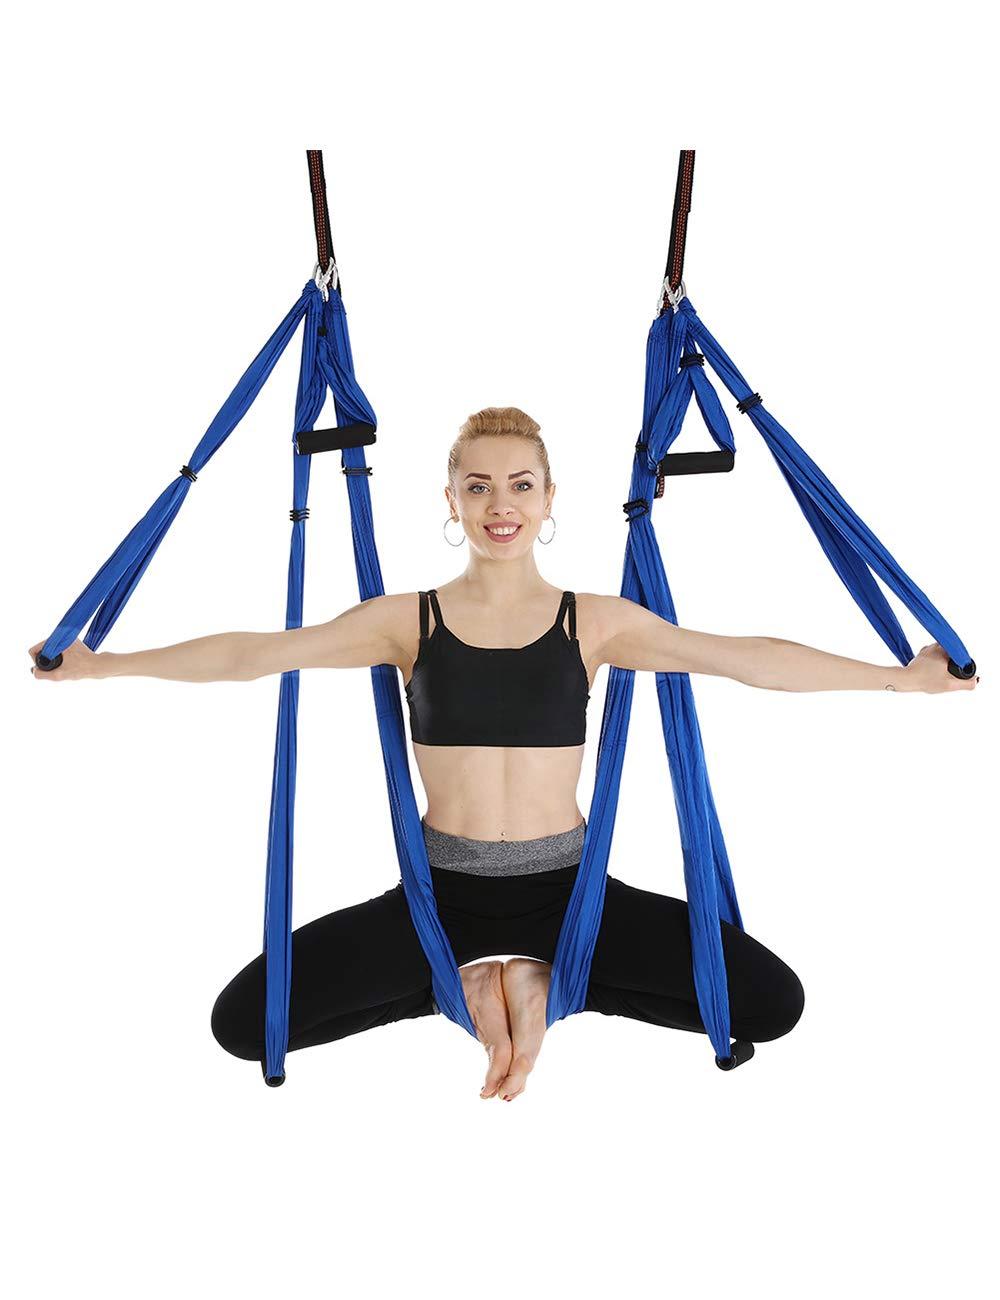 besbomig Pilates Flying Hammock Yoga Swing Aerial Hammock for Bodybuilding Inversion Strap High Strength Gym Indoor Fitness Load